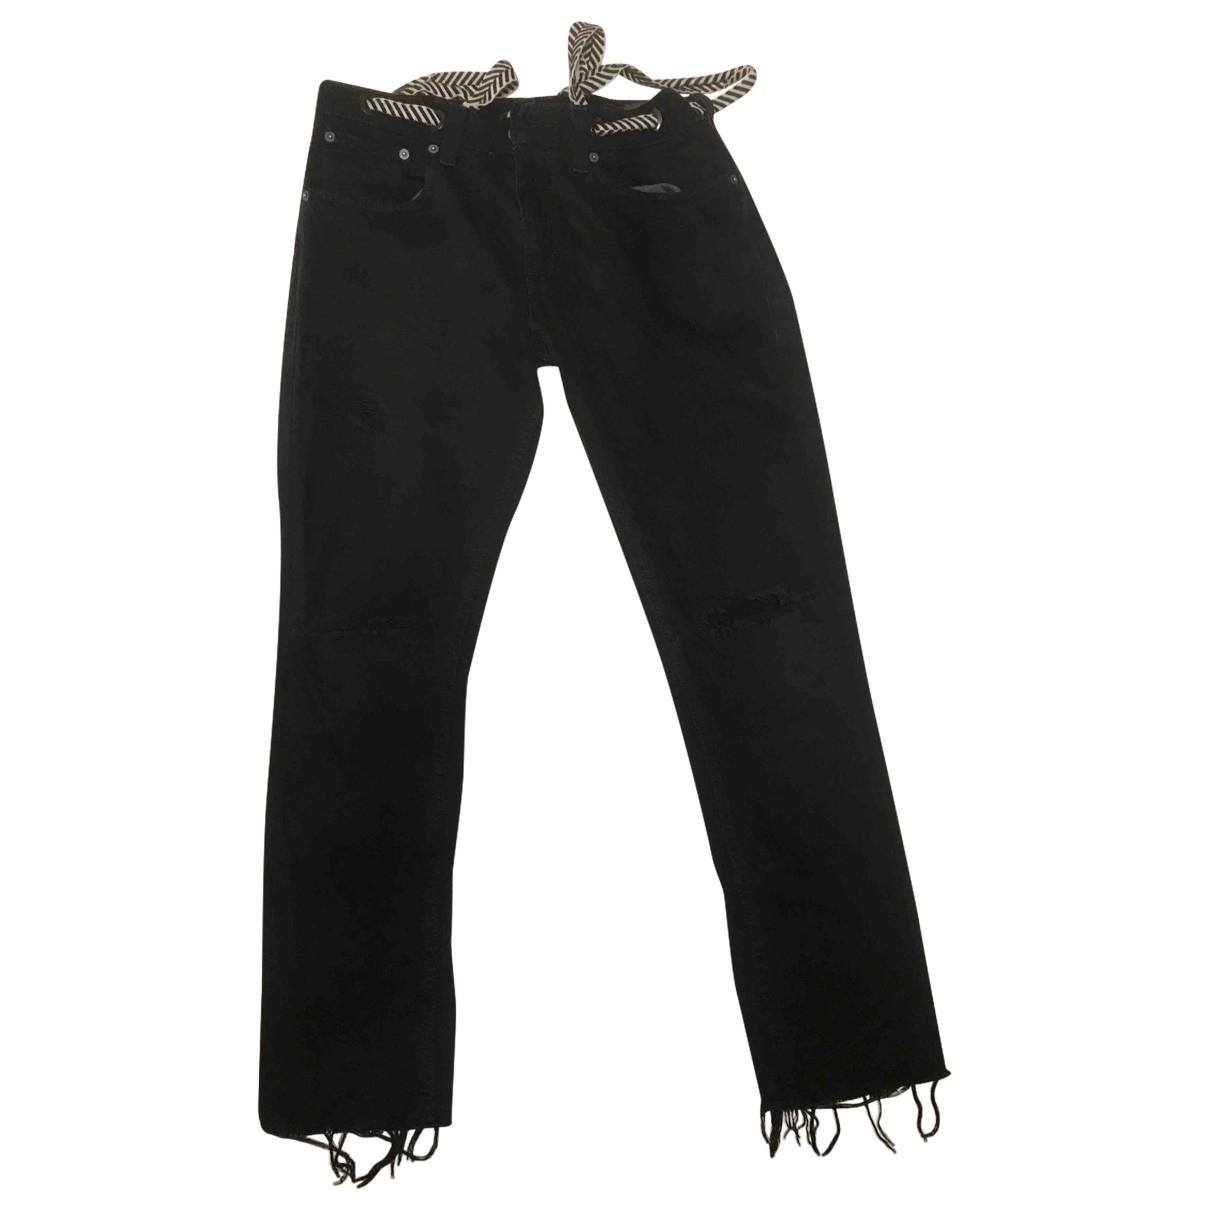 Levi's 501 Black Cotton - elasthane Jeans for Women 30 US